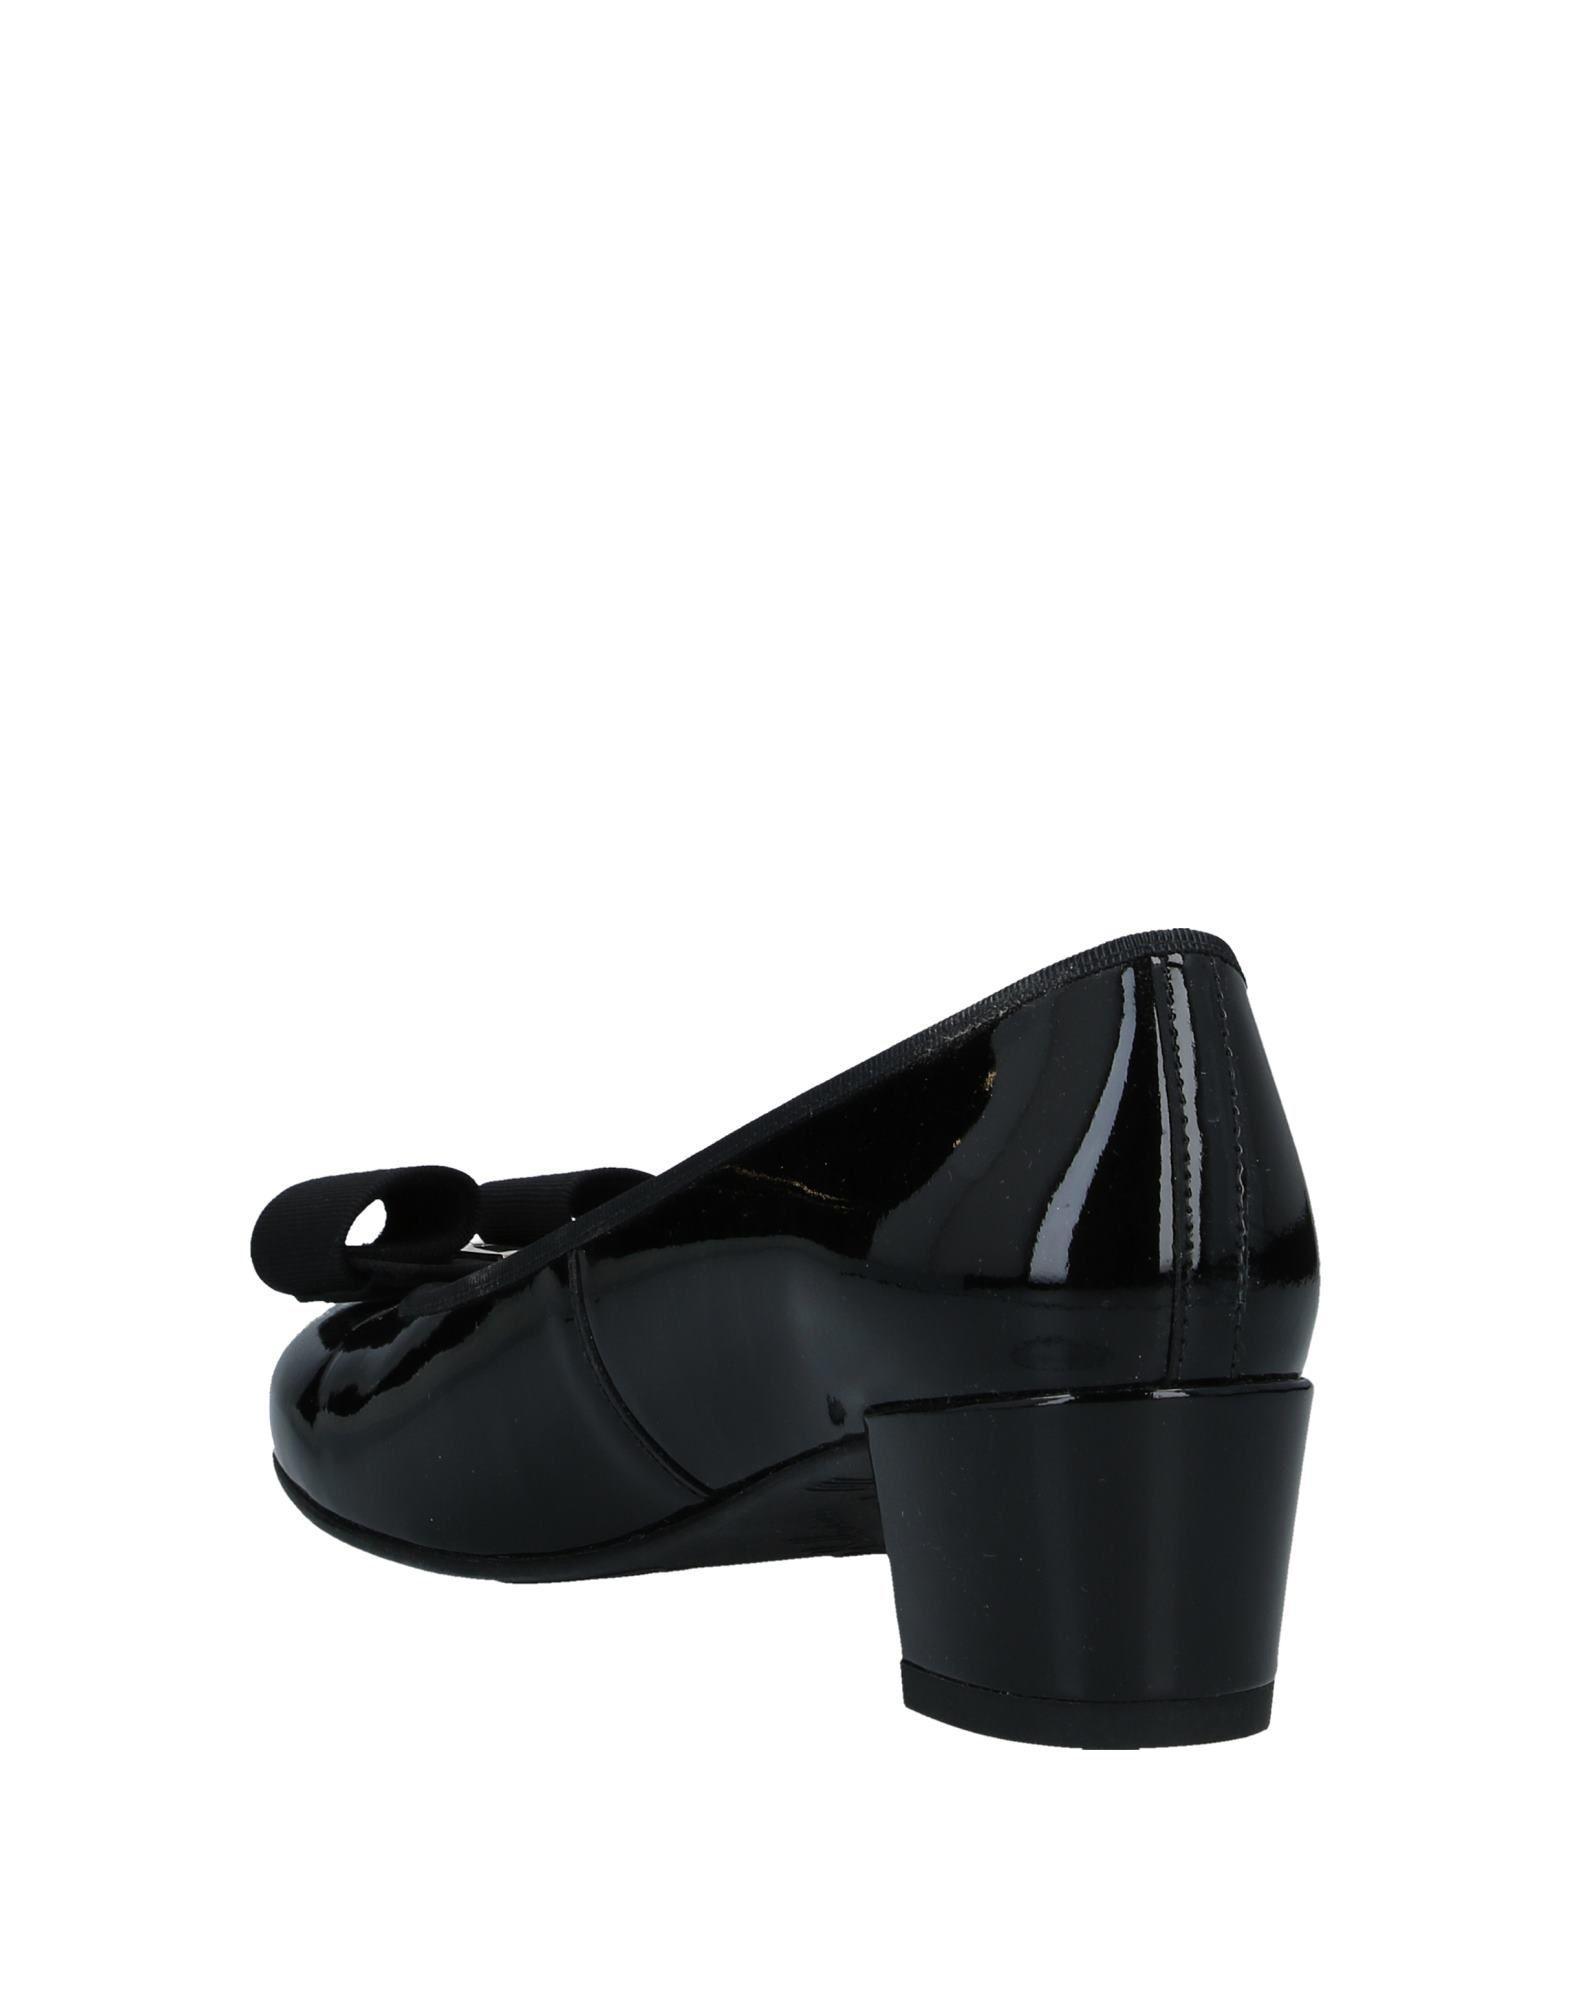 Zapatos de salón Pretty Ballerinas de Caucho de color Negro